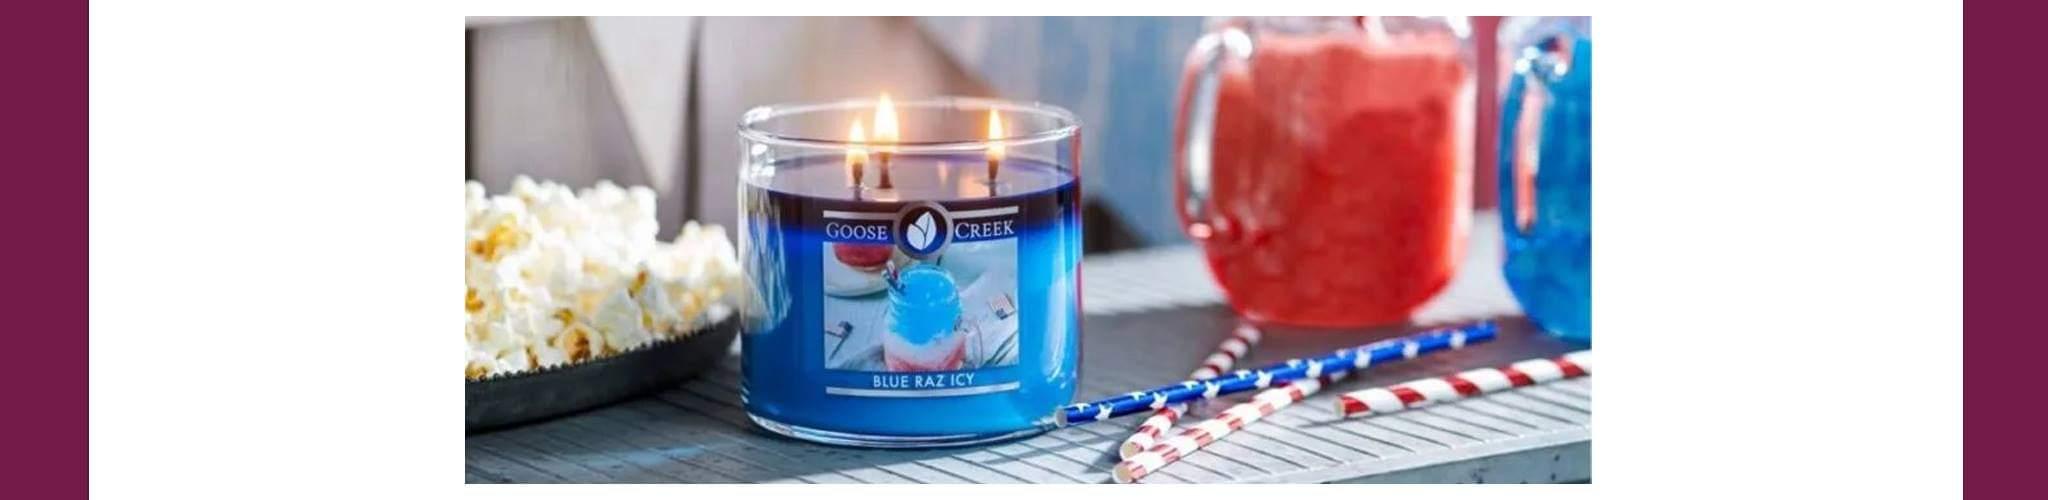 Goose Creek Candle 3-Docht-Kerzen